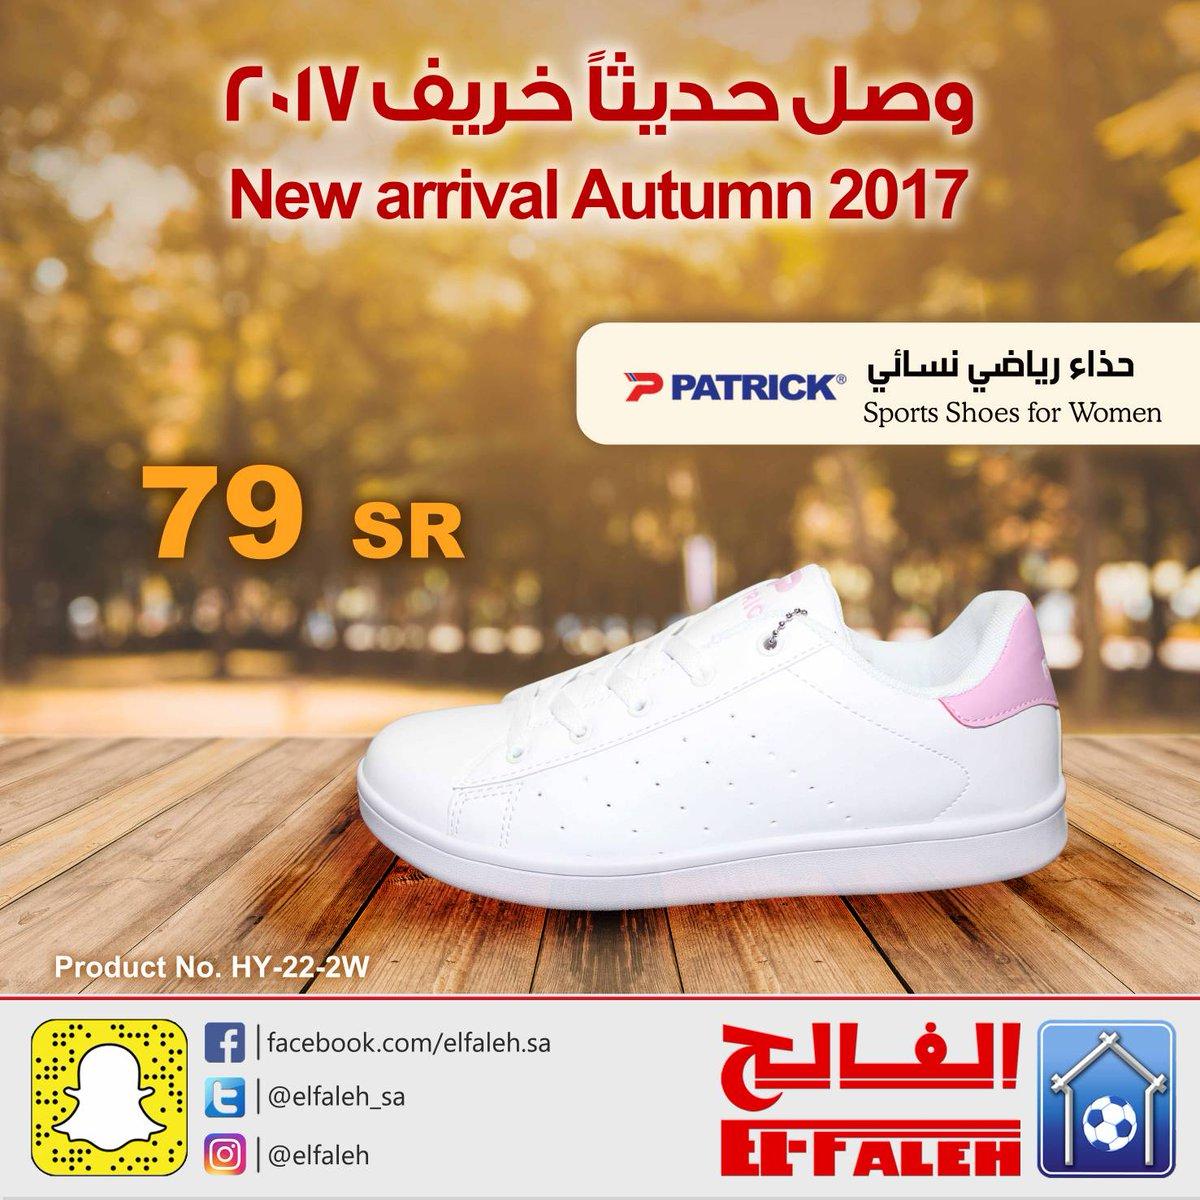 0e05c068c بيت الرياضة الفالح on Twitter: